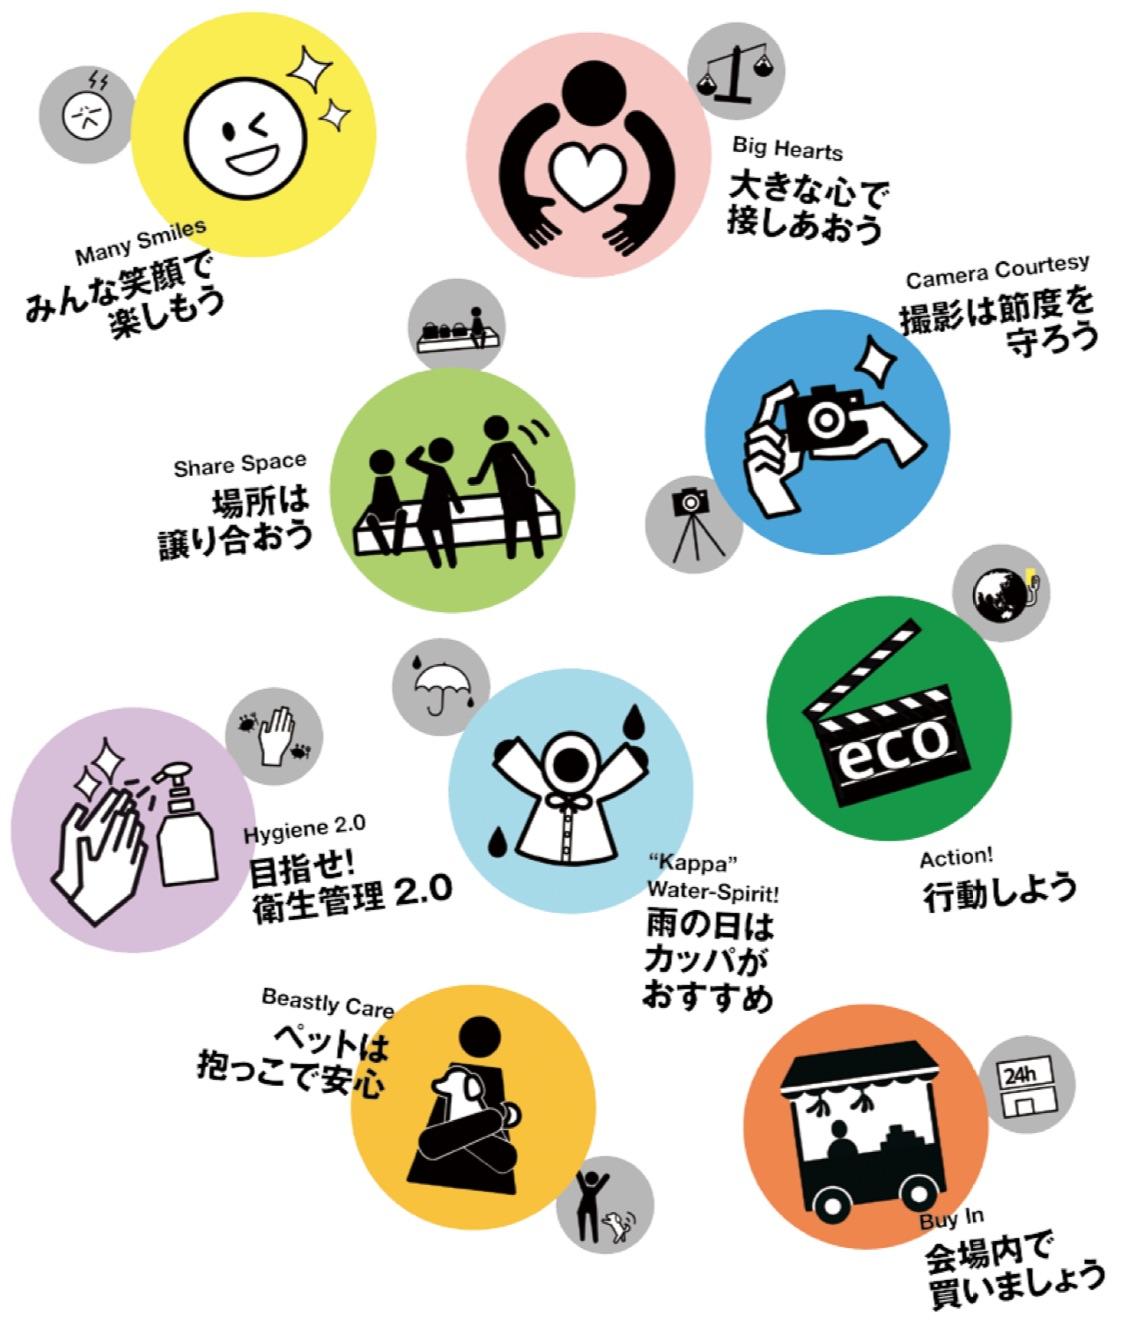 wmdf-way-icons